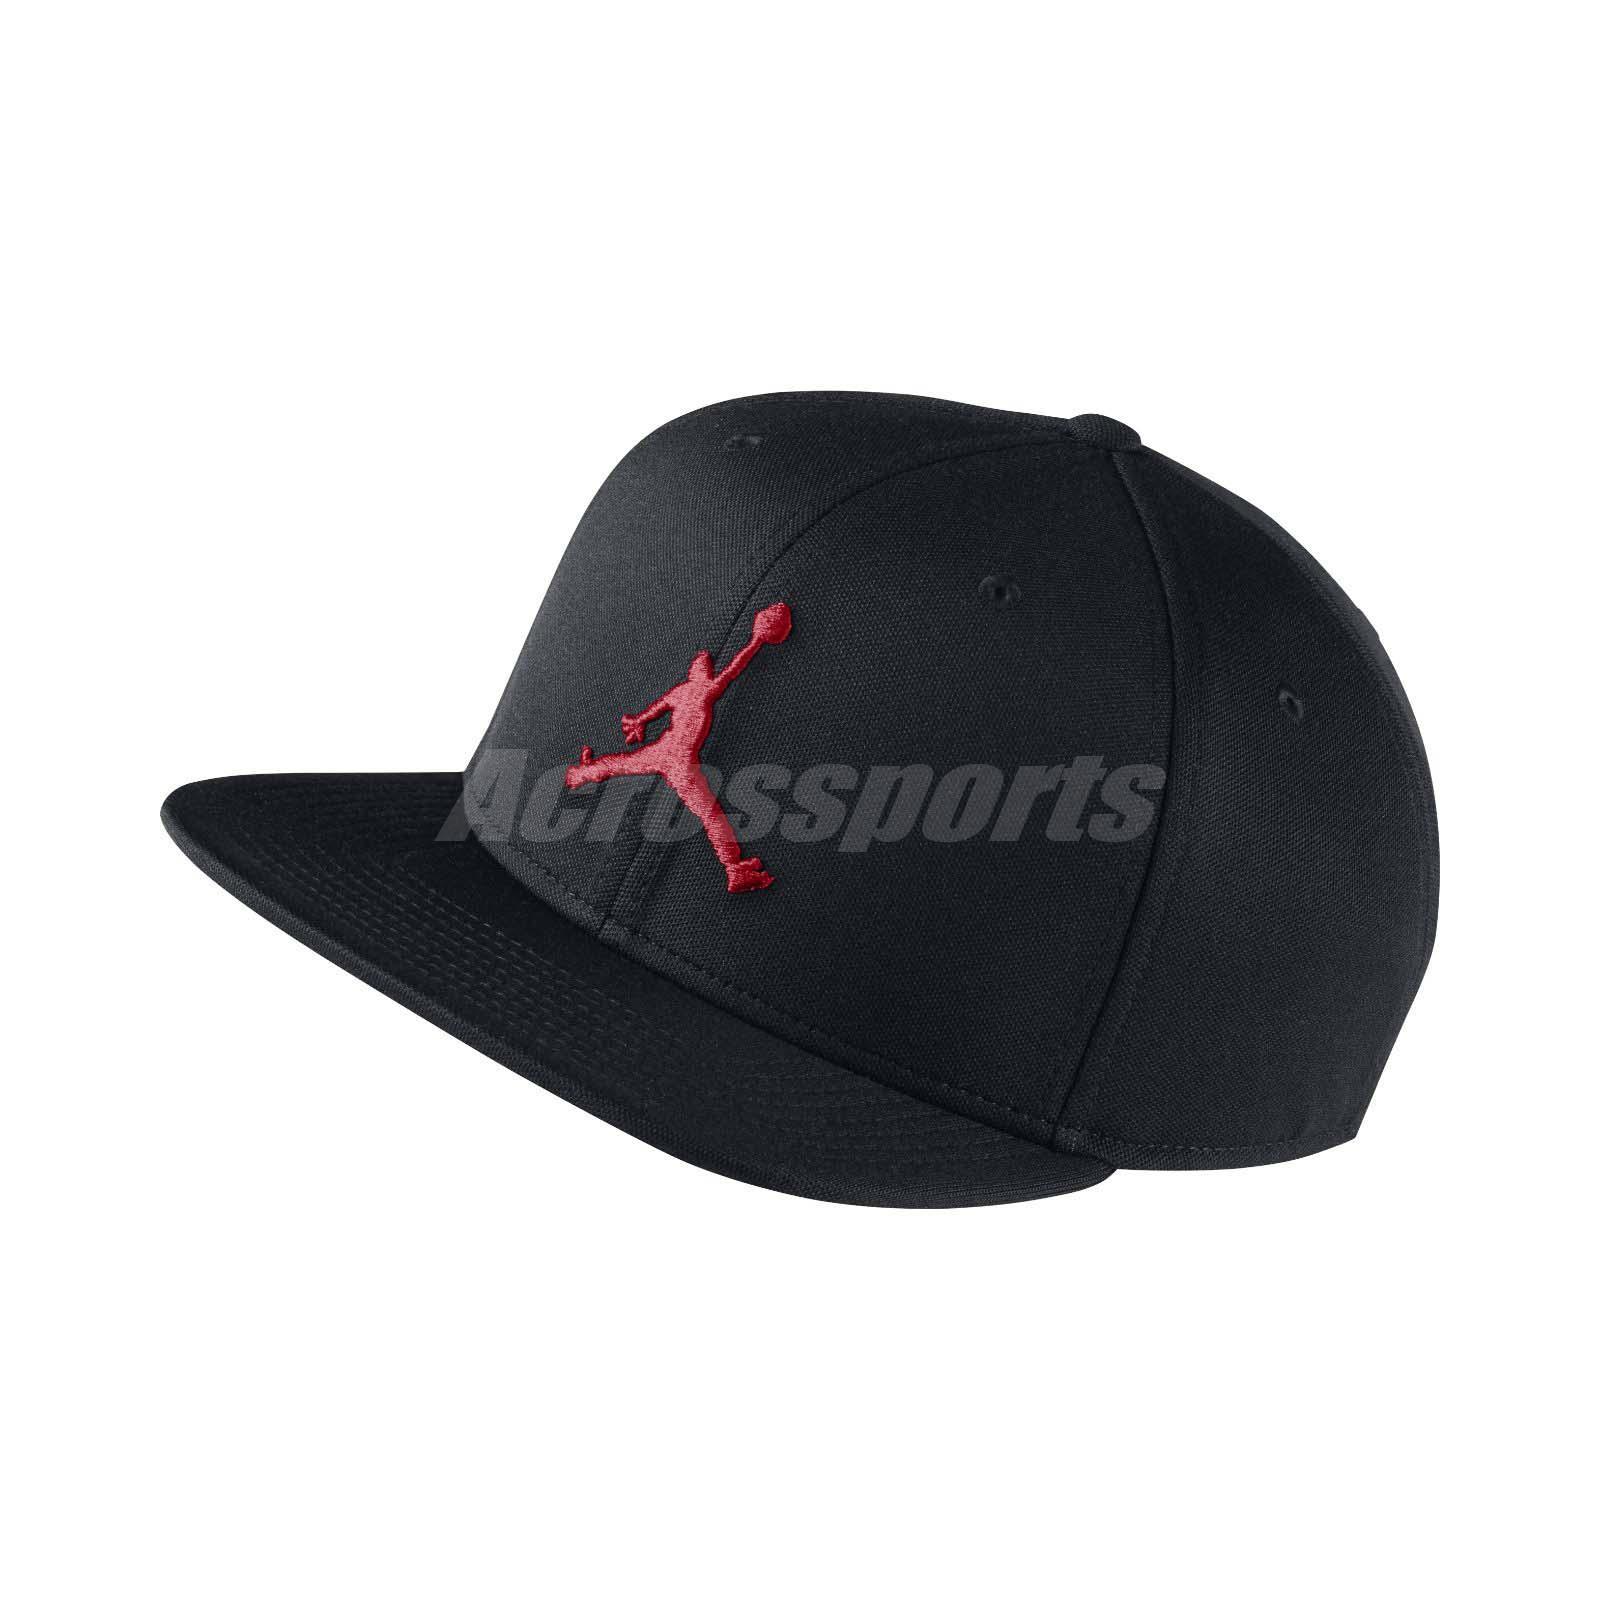 15cd33465cb Details about Nike Jordan Jumpman Snapback Cap Sport Baseball Training  Black Red 861452-011